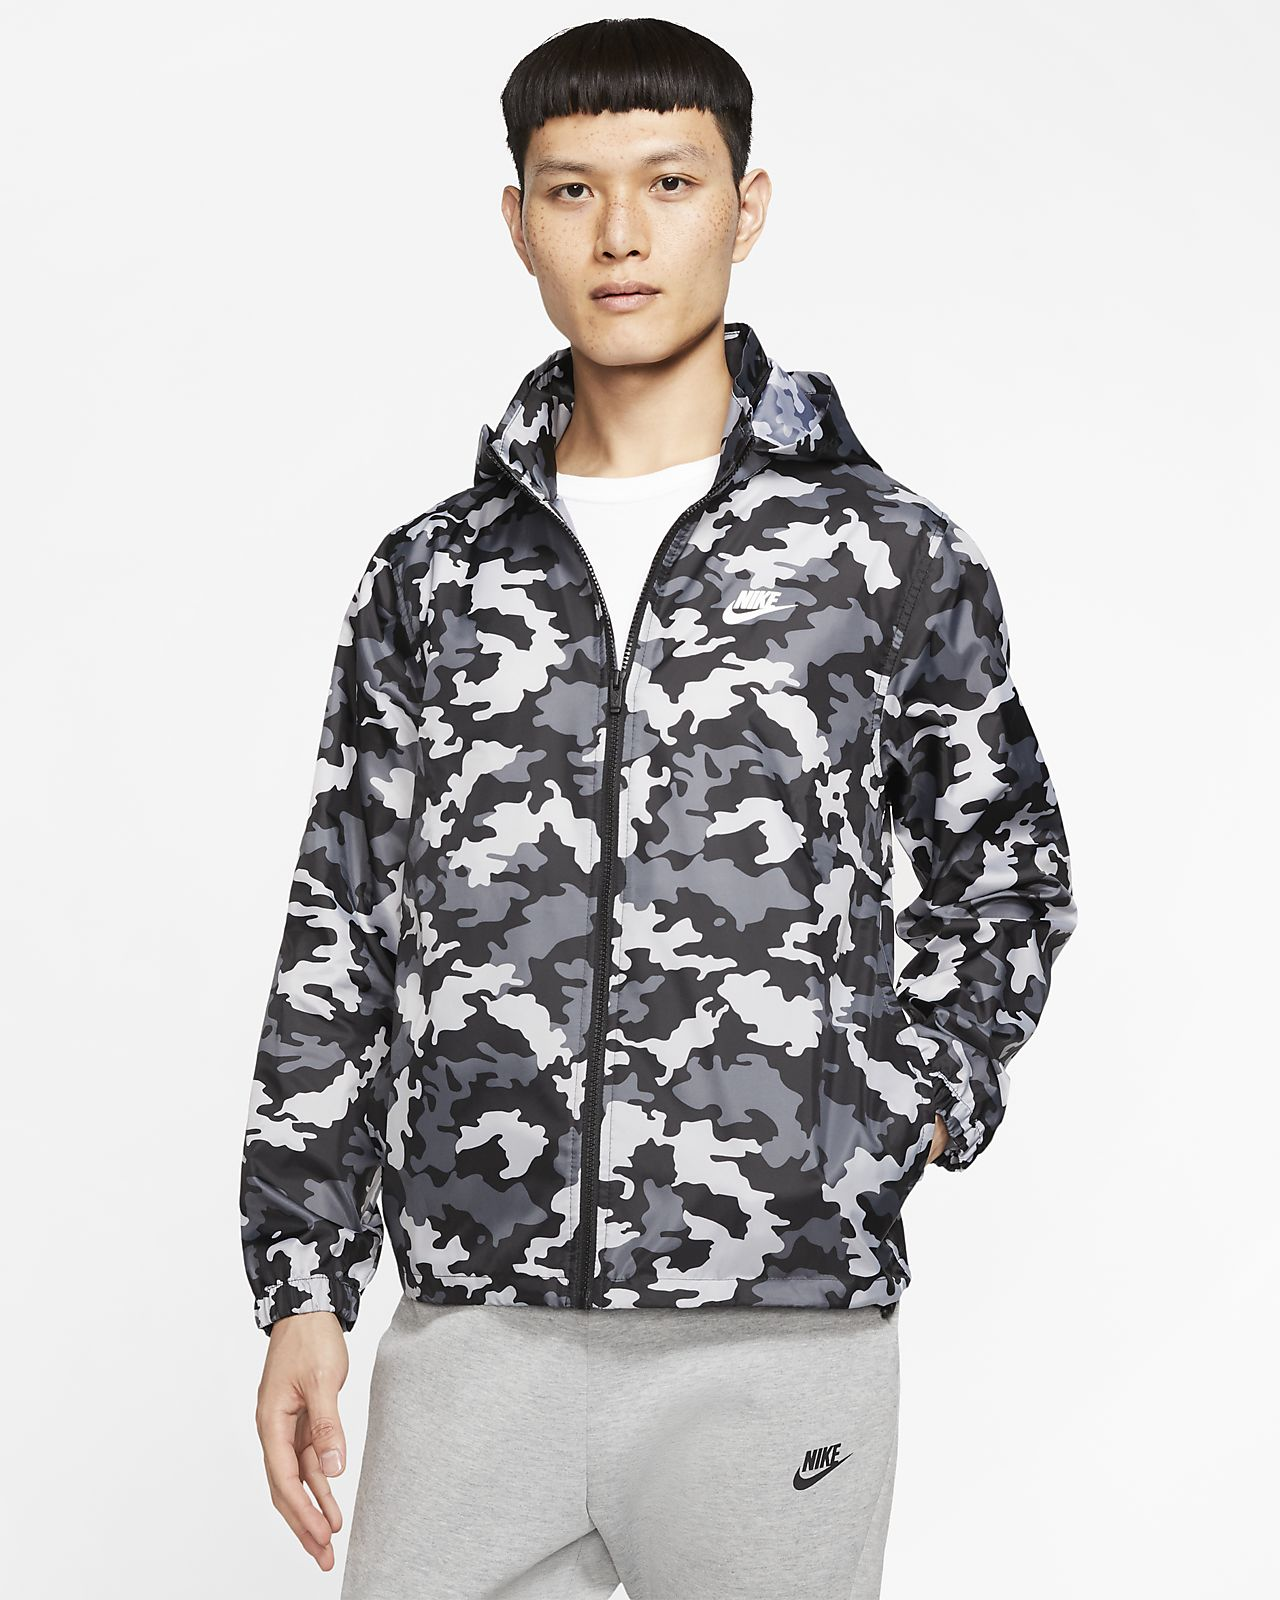 Nike Sportswear男子迷彩连帽夹克